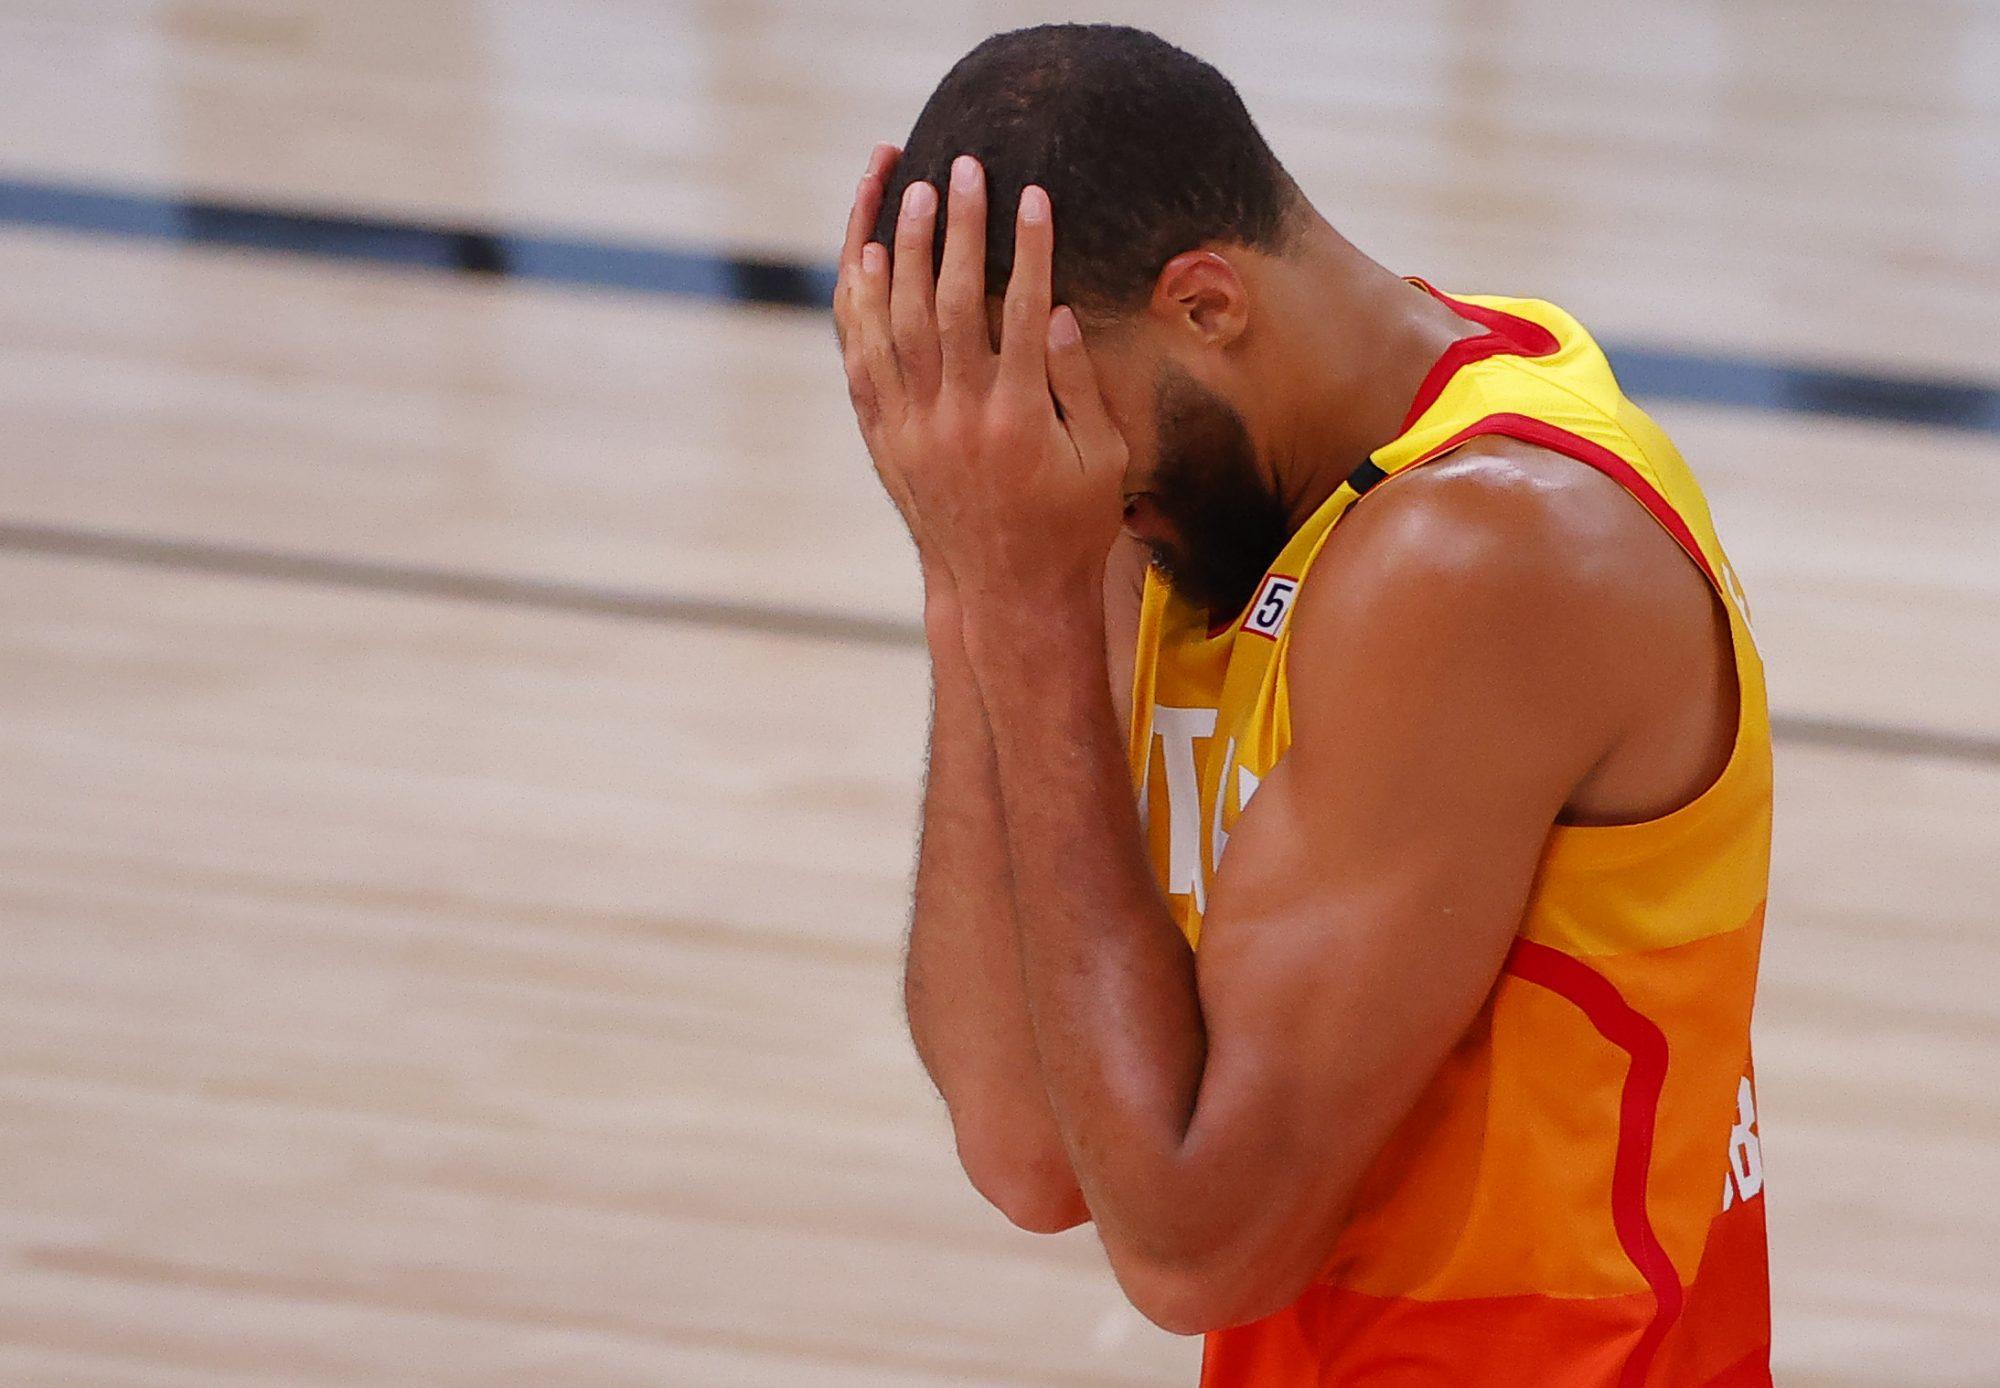 Rudy Gobert of the Utah Jazz looks miserable.